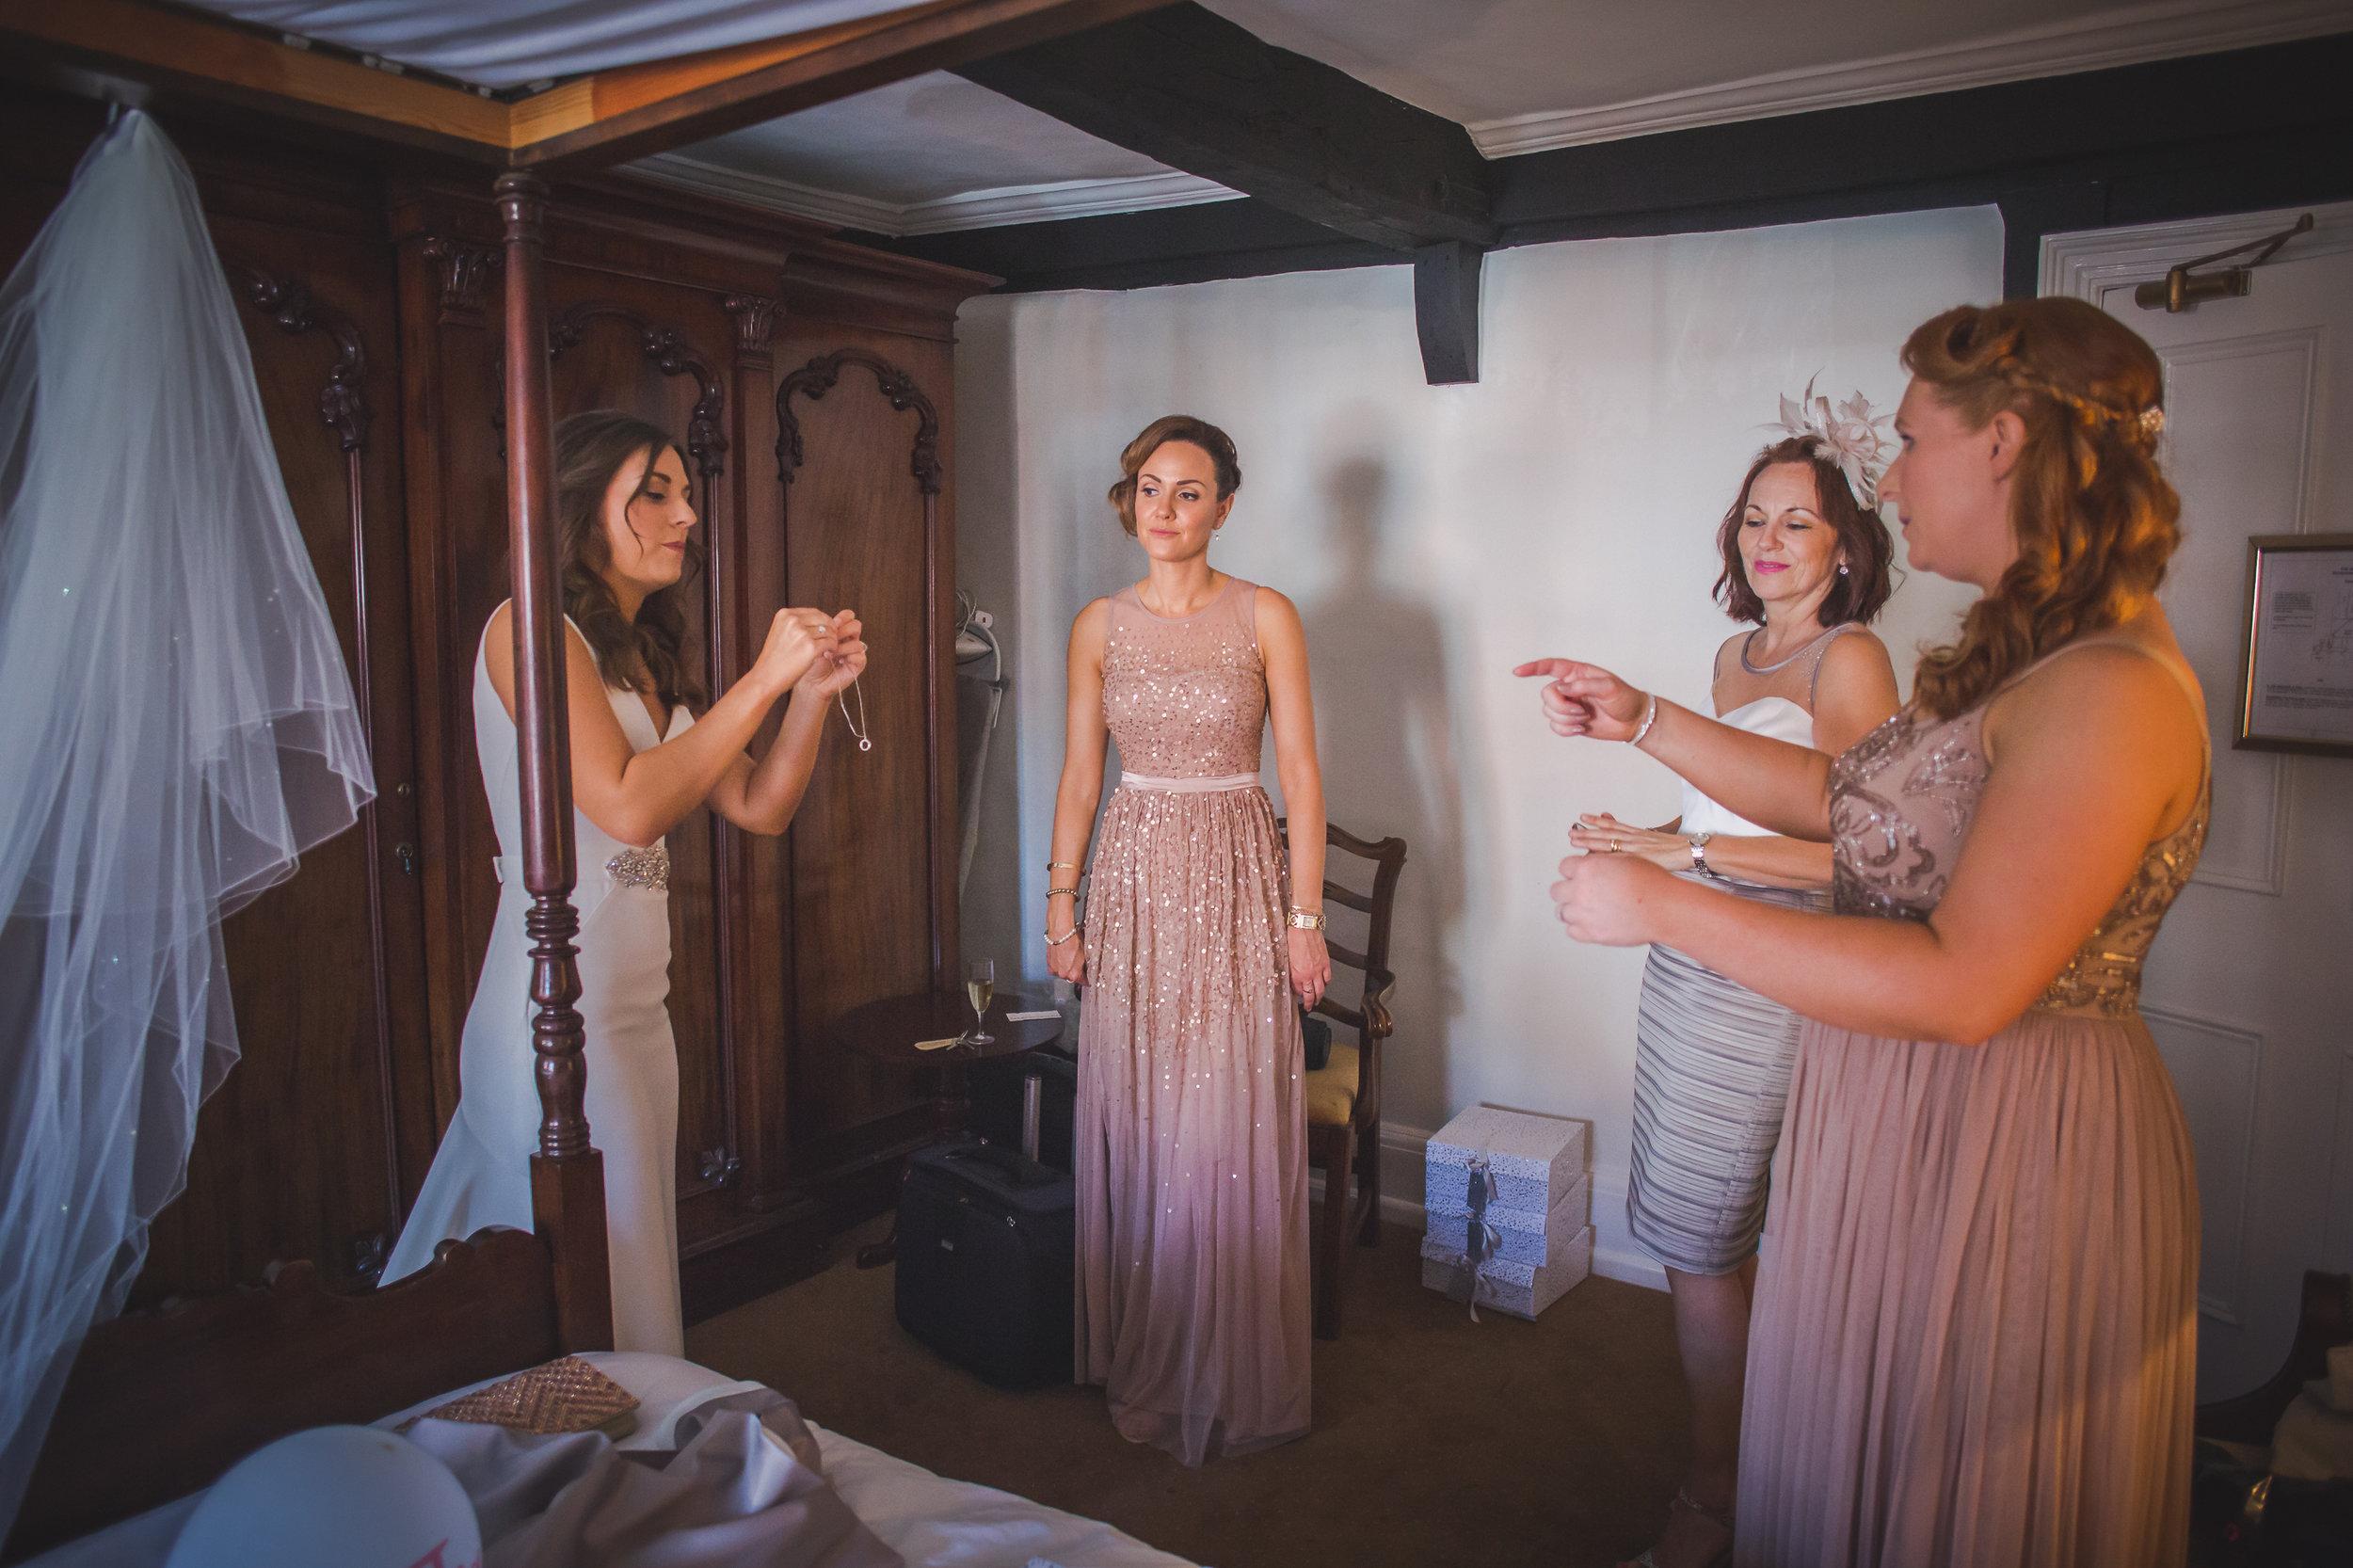 Grittenham Barn female wedding photographers west sussex petworth social-12.jpg